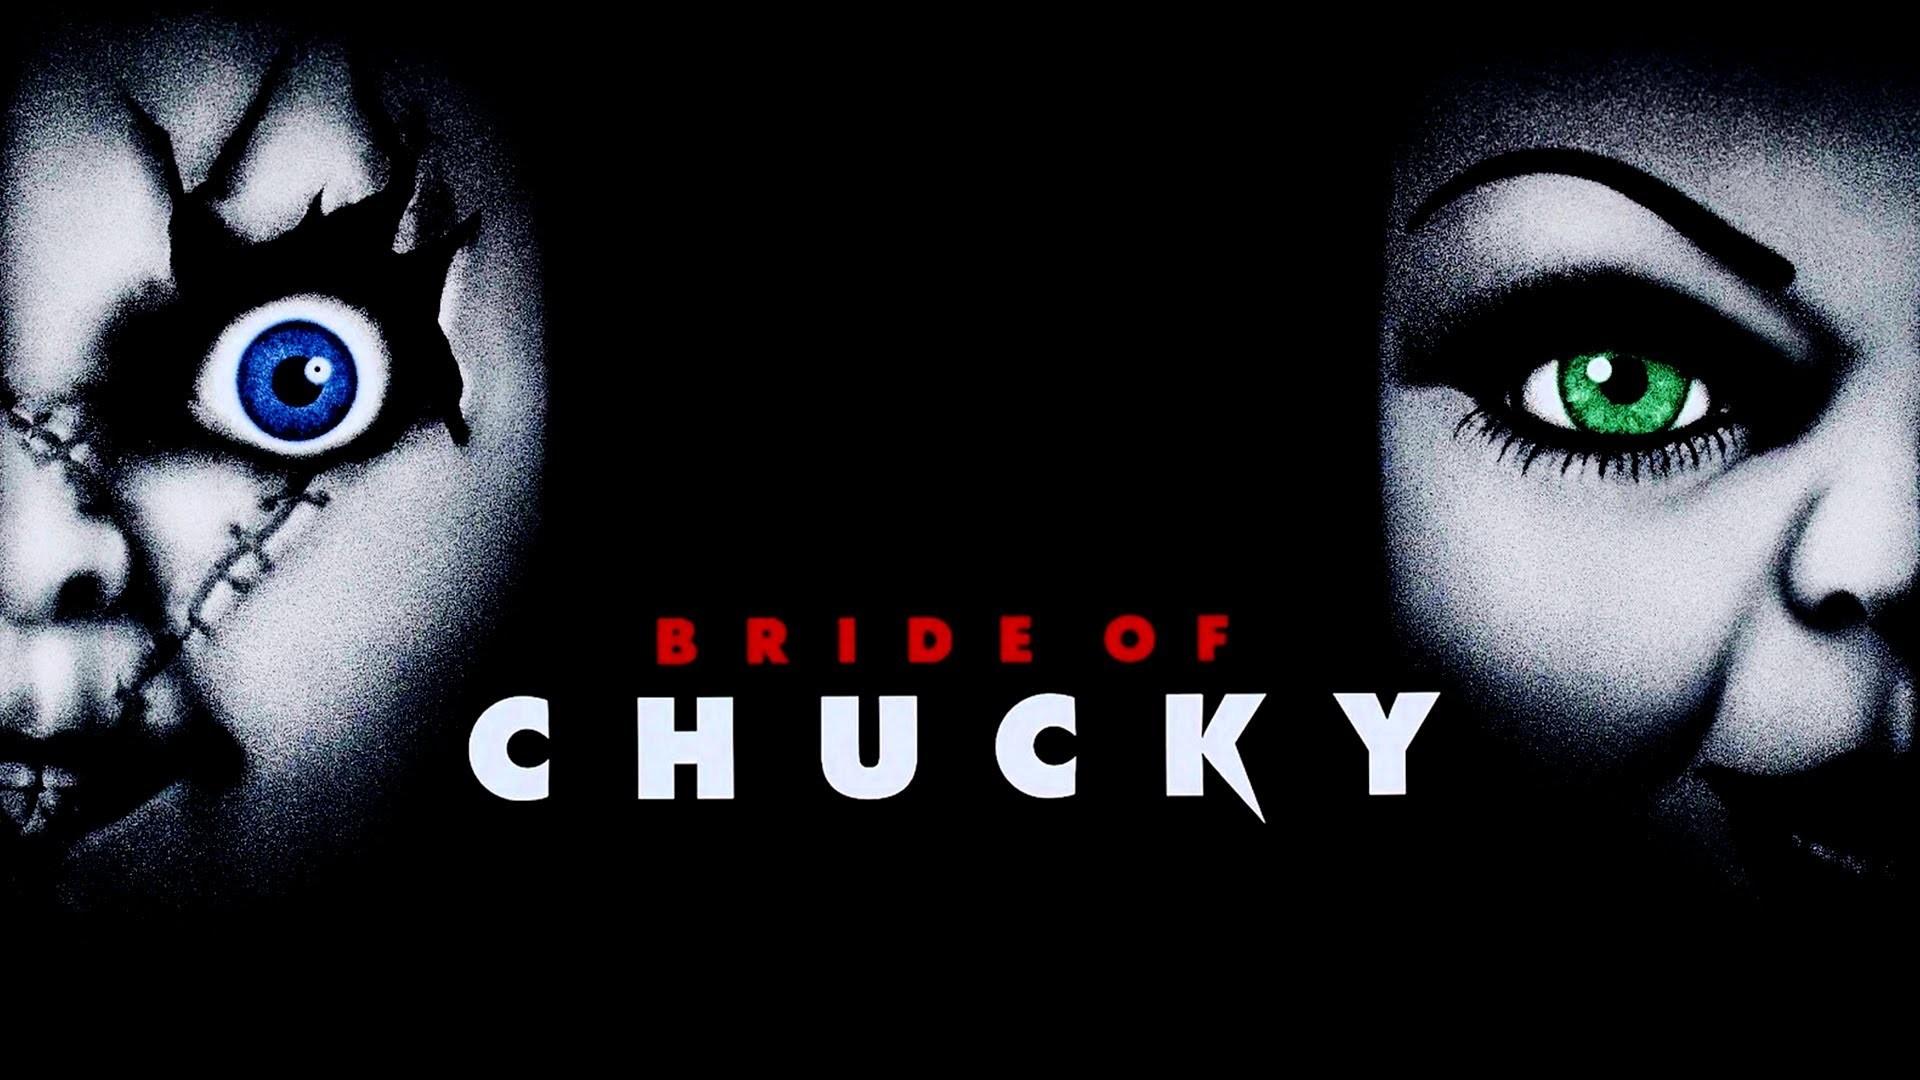 Bride Of Chucky (Movie Review)